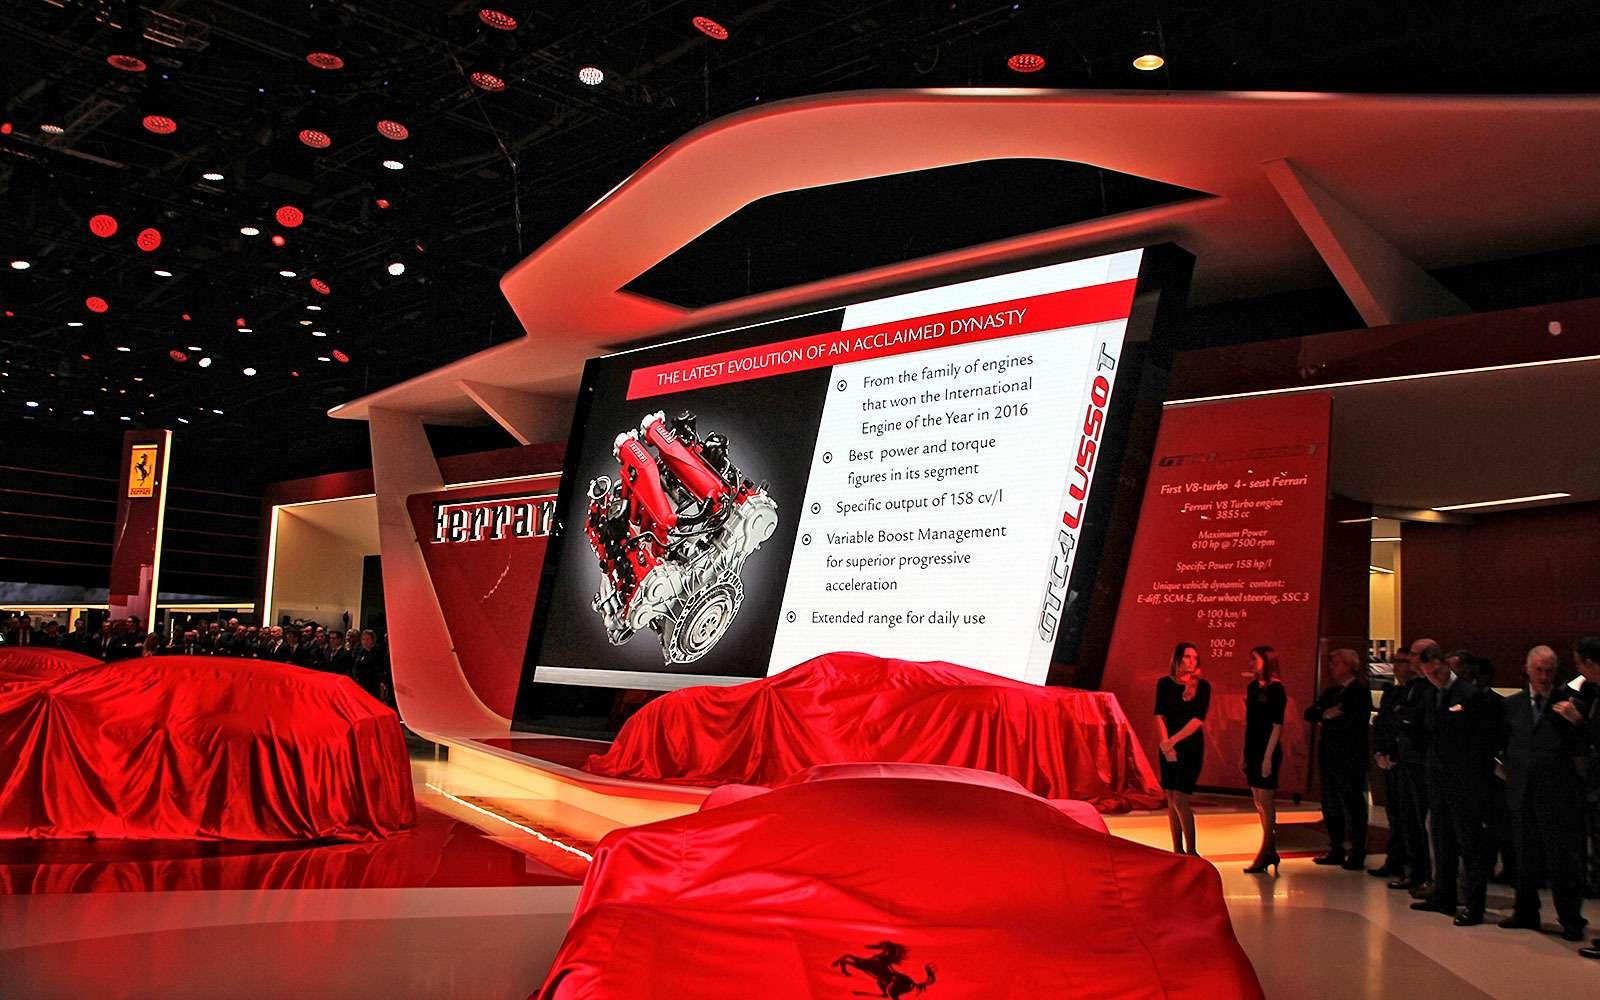 Махнул неглядя: Ferrari GTC4Lusso Tпоменял полный привод натурбонаддув— фото 641671